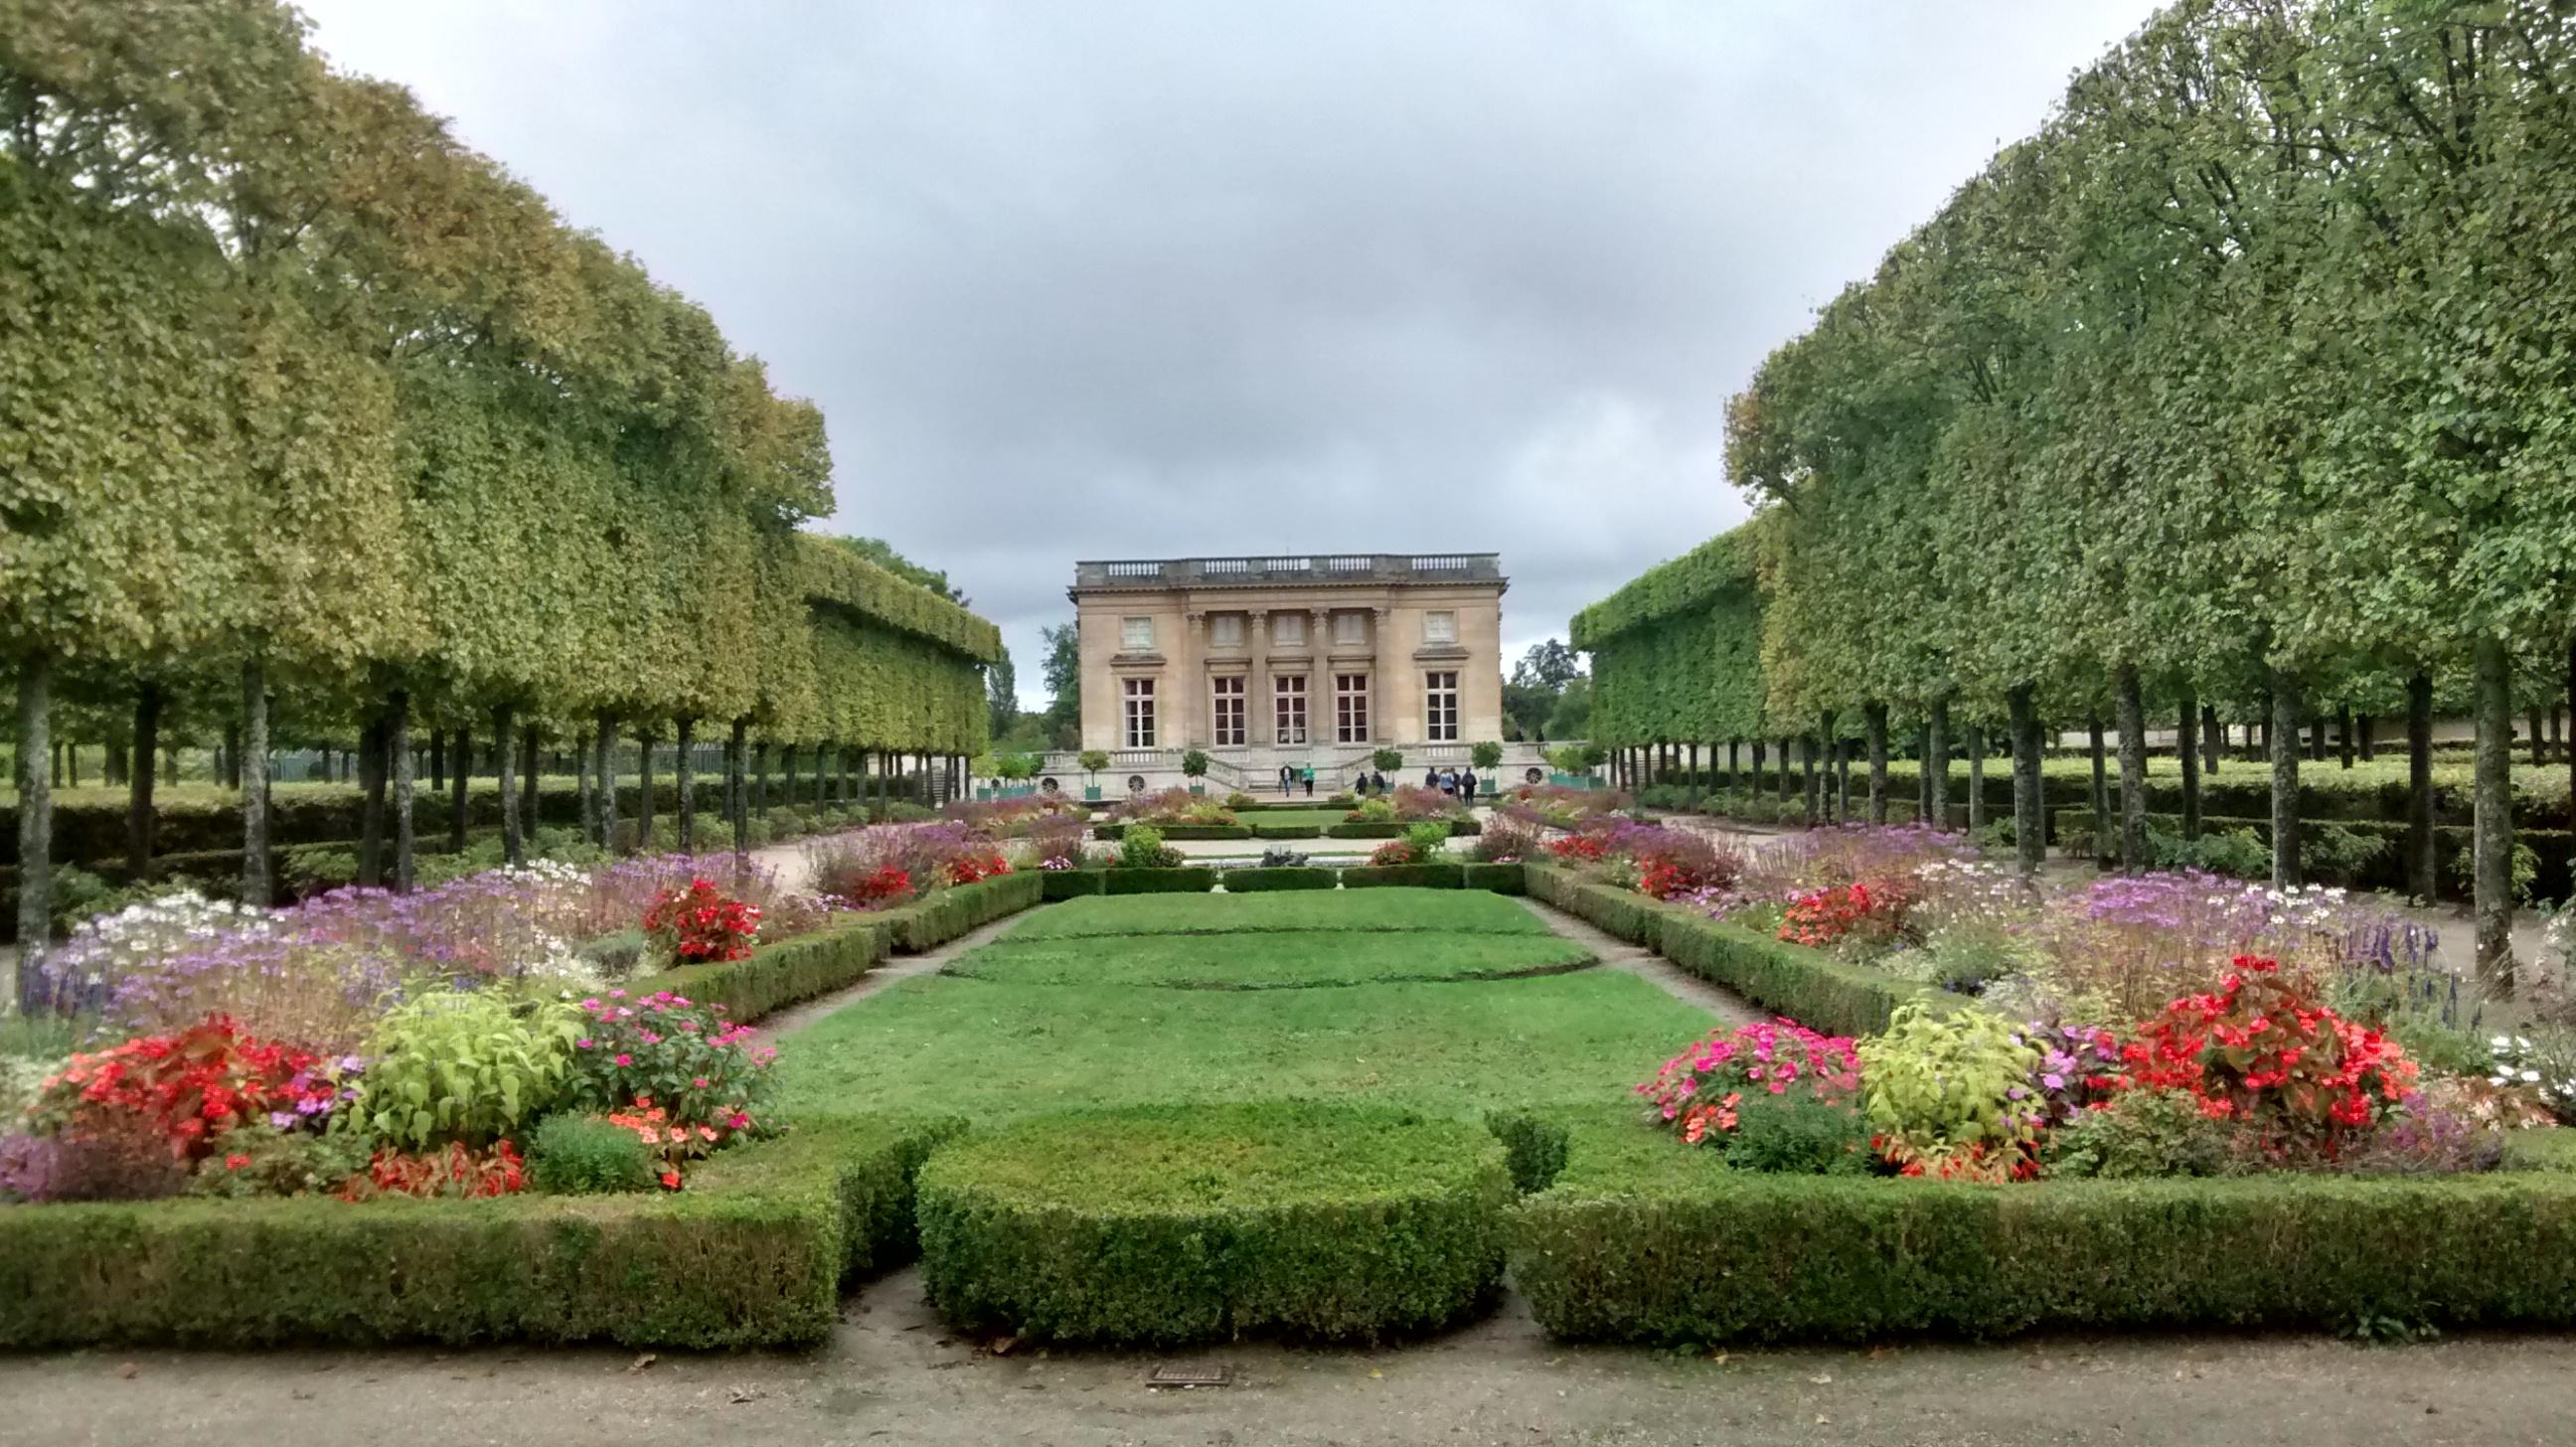 Le grand trianon frn 325 architecture fran aise for Jardin anglais du petit trianon